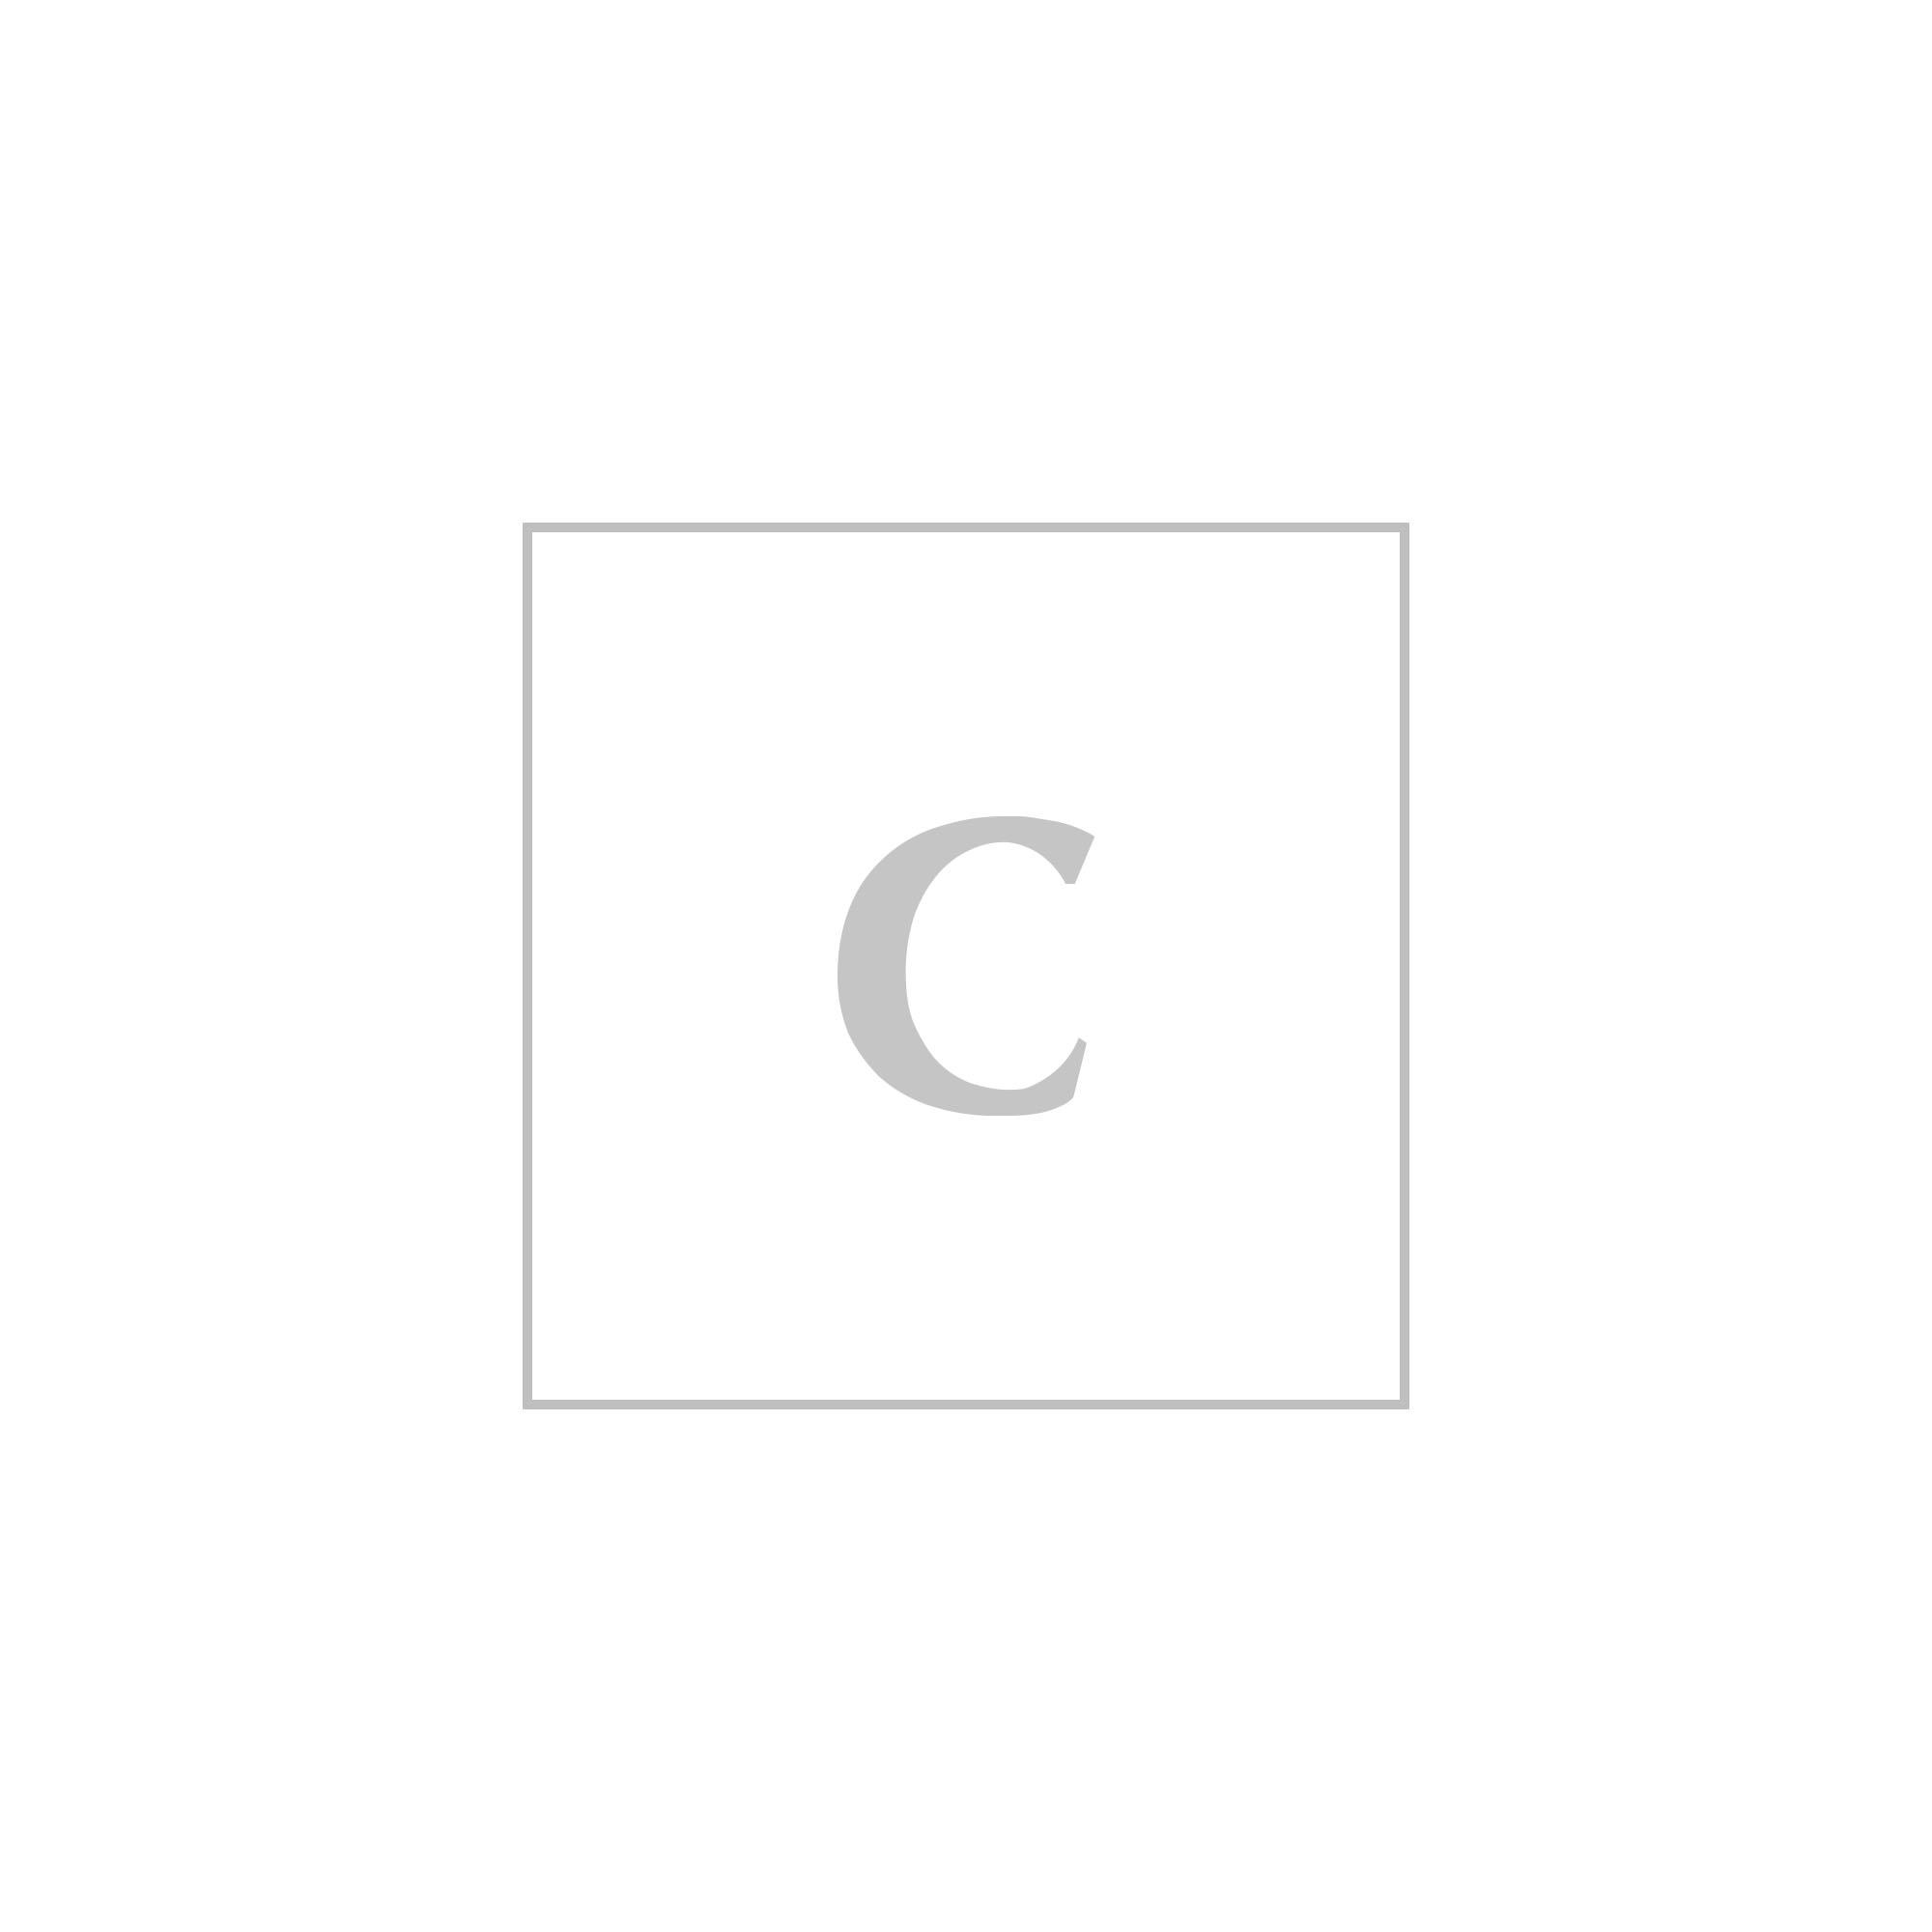 Salvatore ferragamo blusa 13d859 002 pura seta